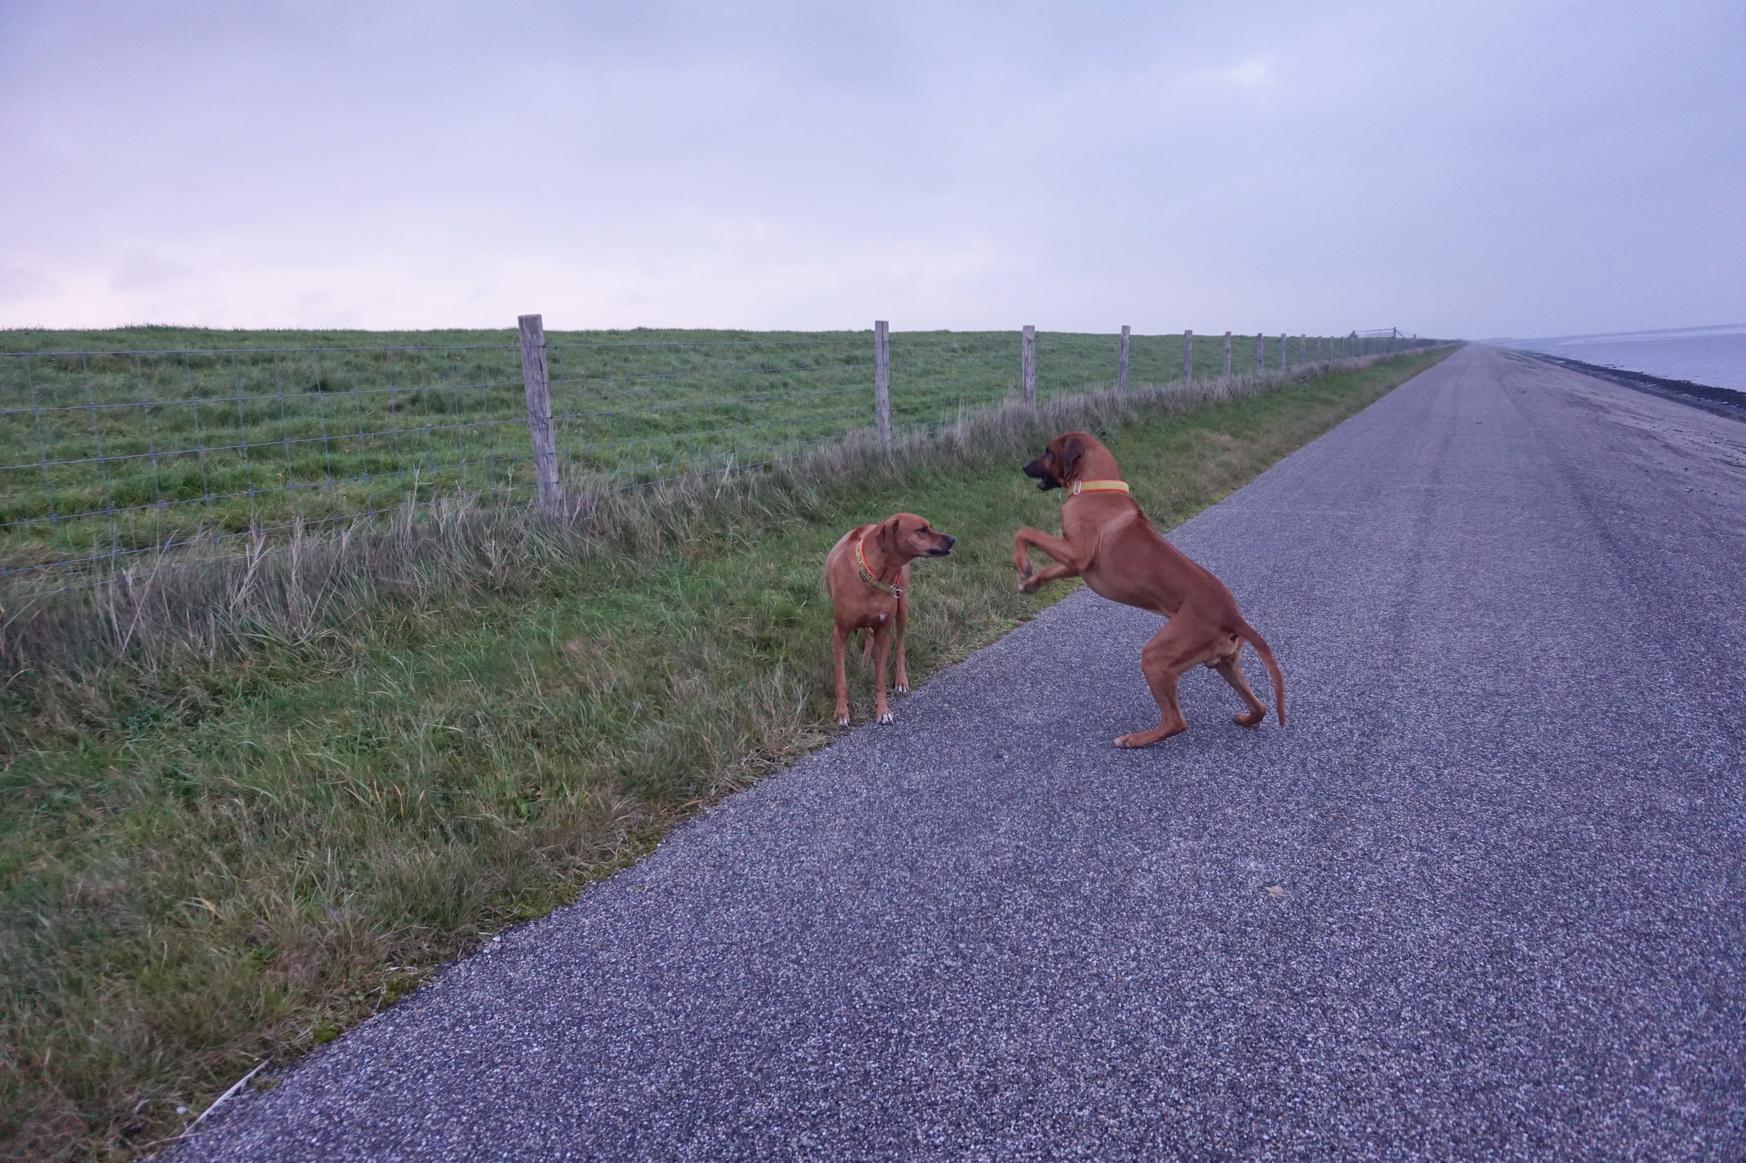 Texel - Deichspaziergang